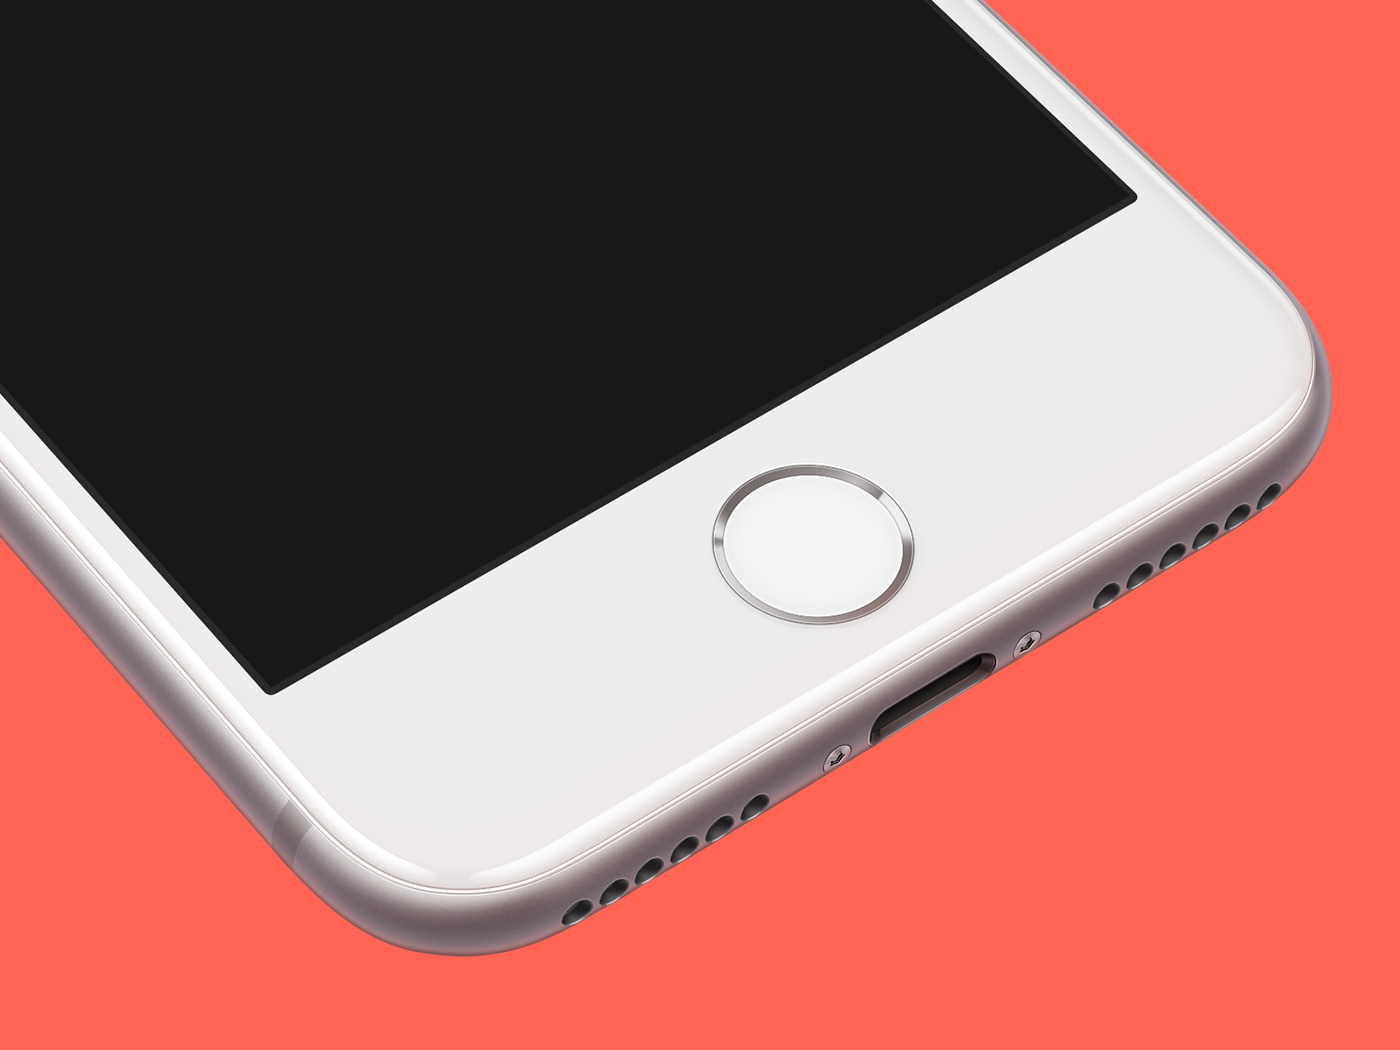 Iphone 8 silver pesrpective mockup template psd